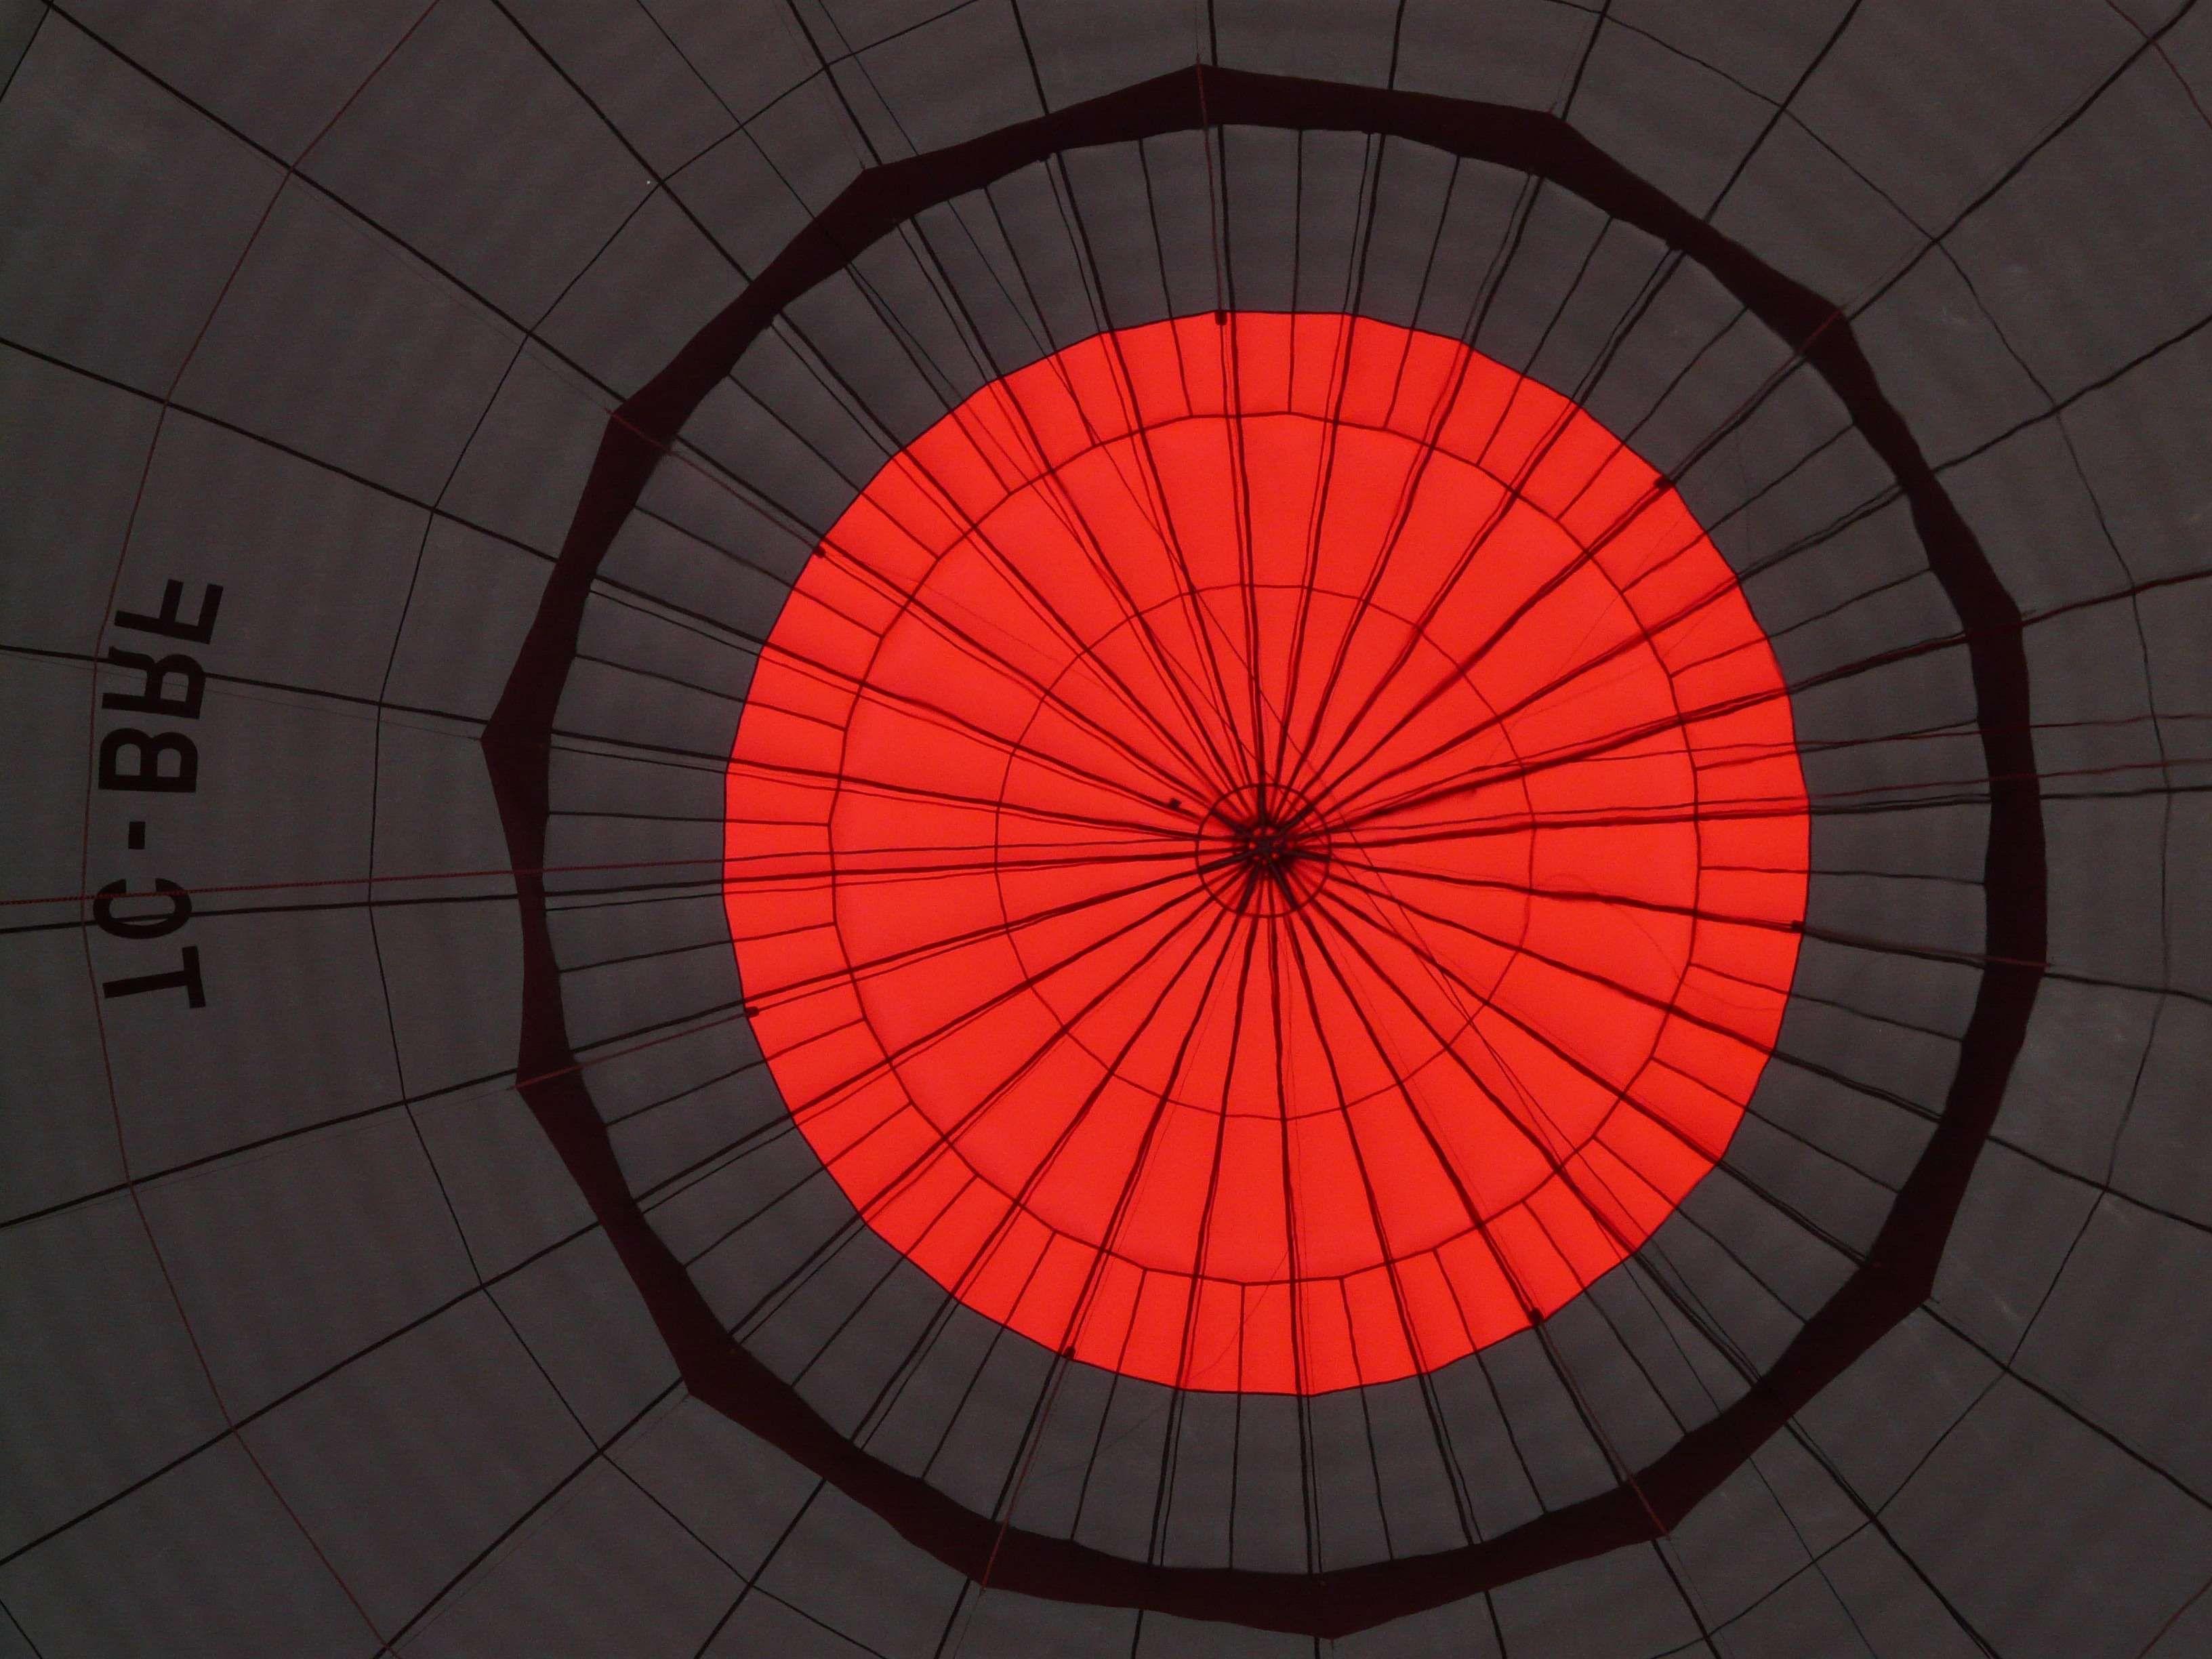 air sports balloon envelope black captive balloon